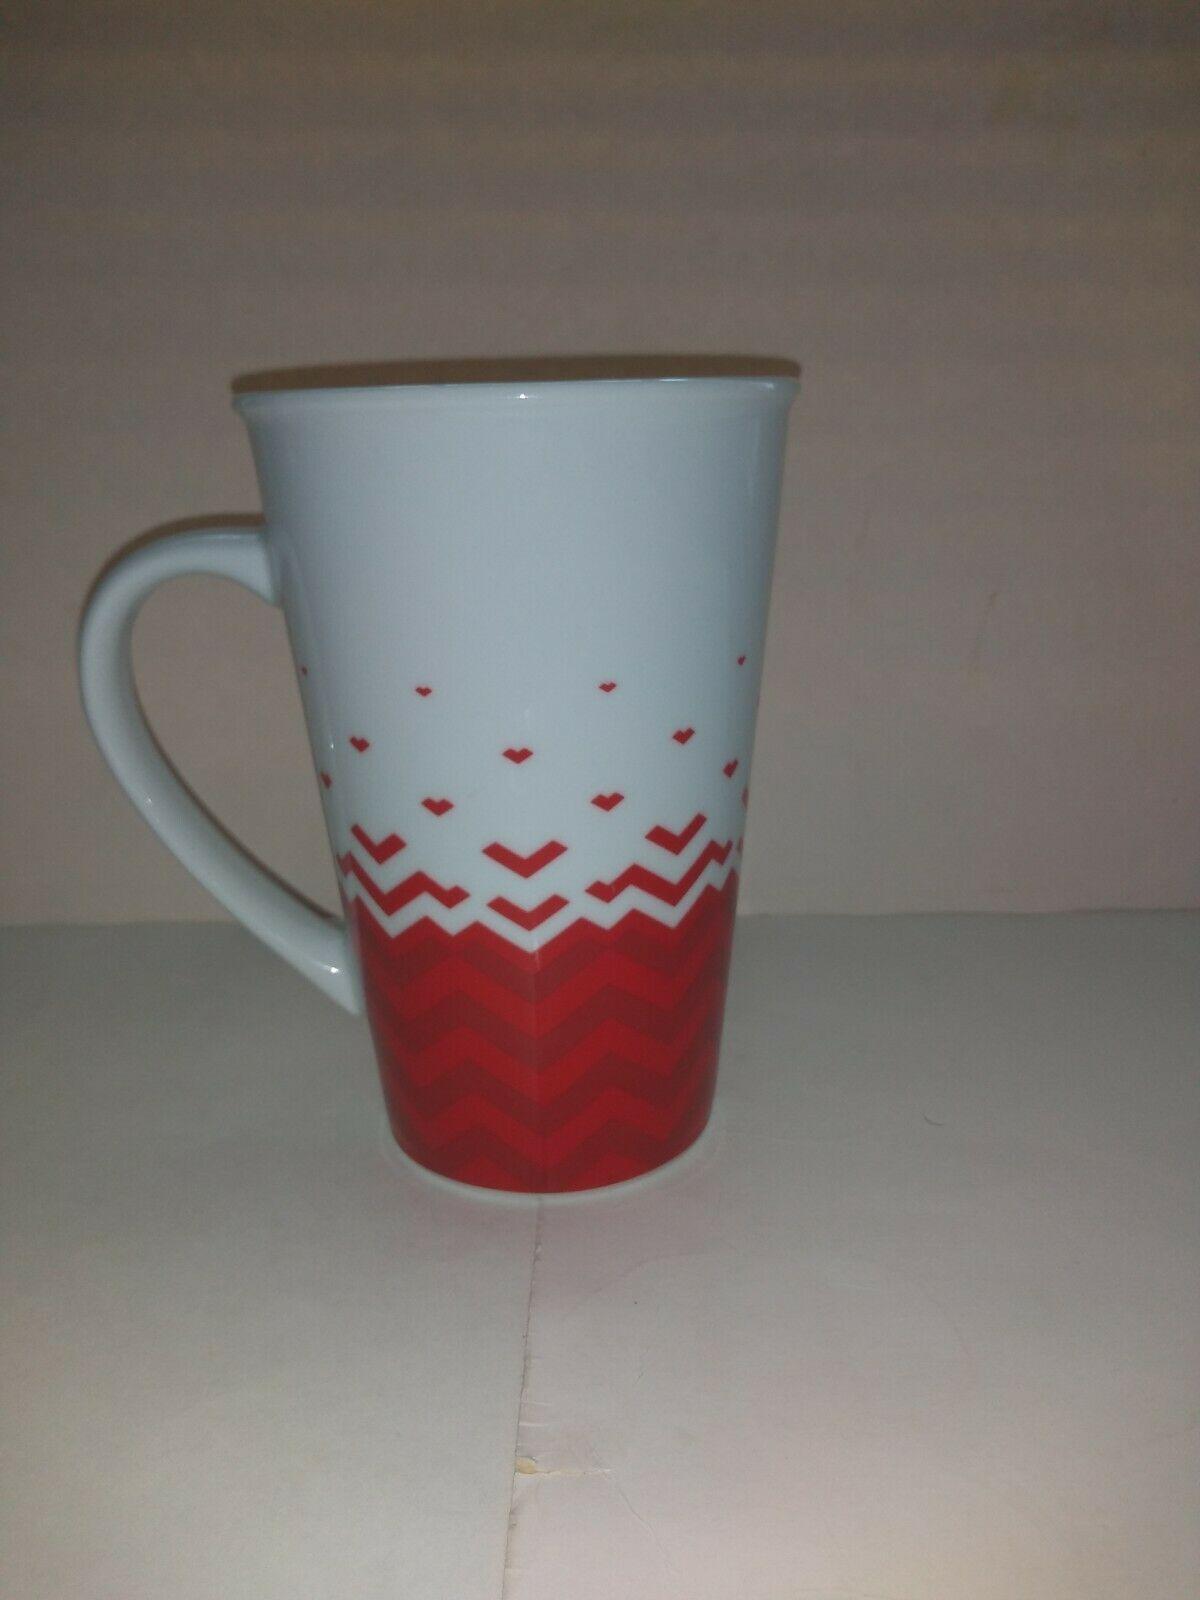 Starbucks 2013 Red White Hearts Valentines Day Mug 22 OZ  image 3